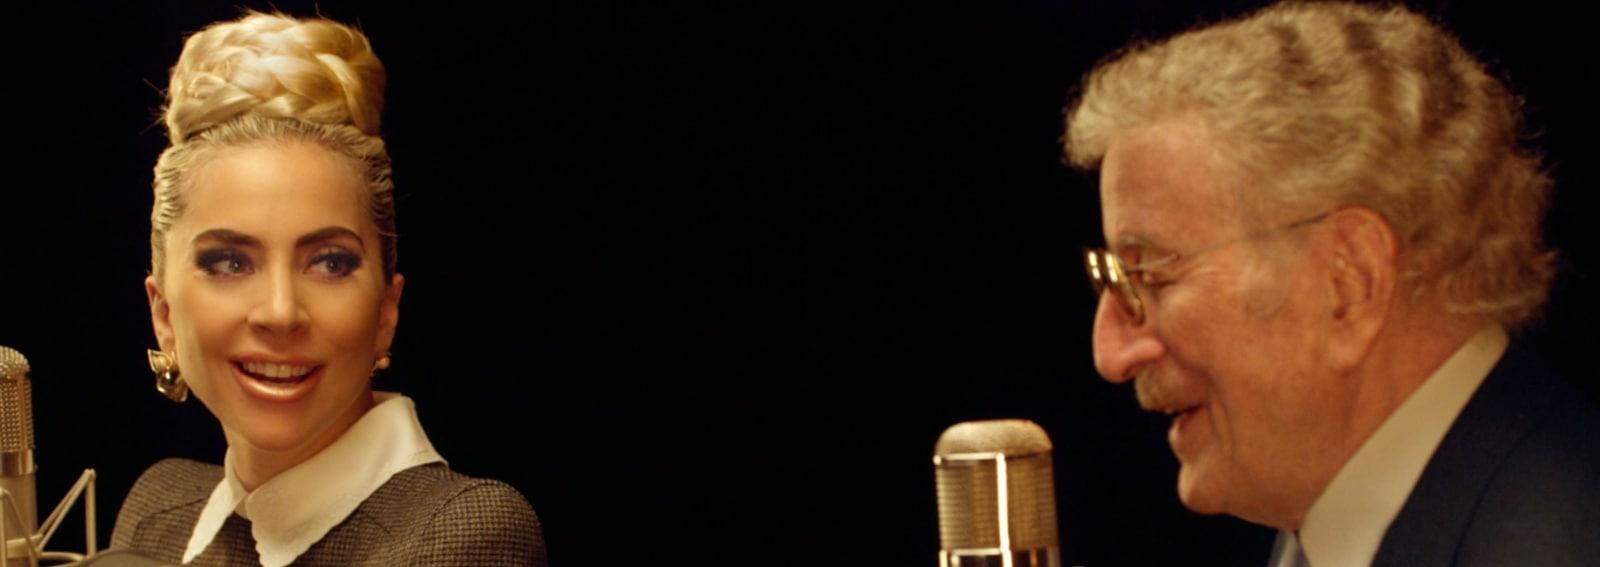 radio montecarlo Tony Bennett Lady Gaga hero